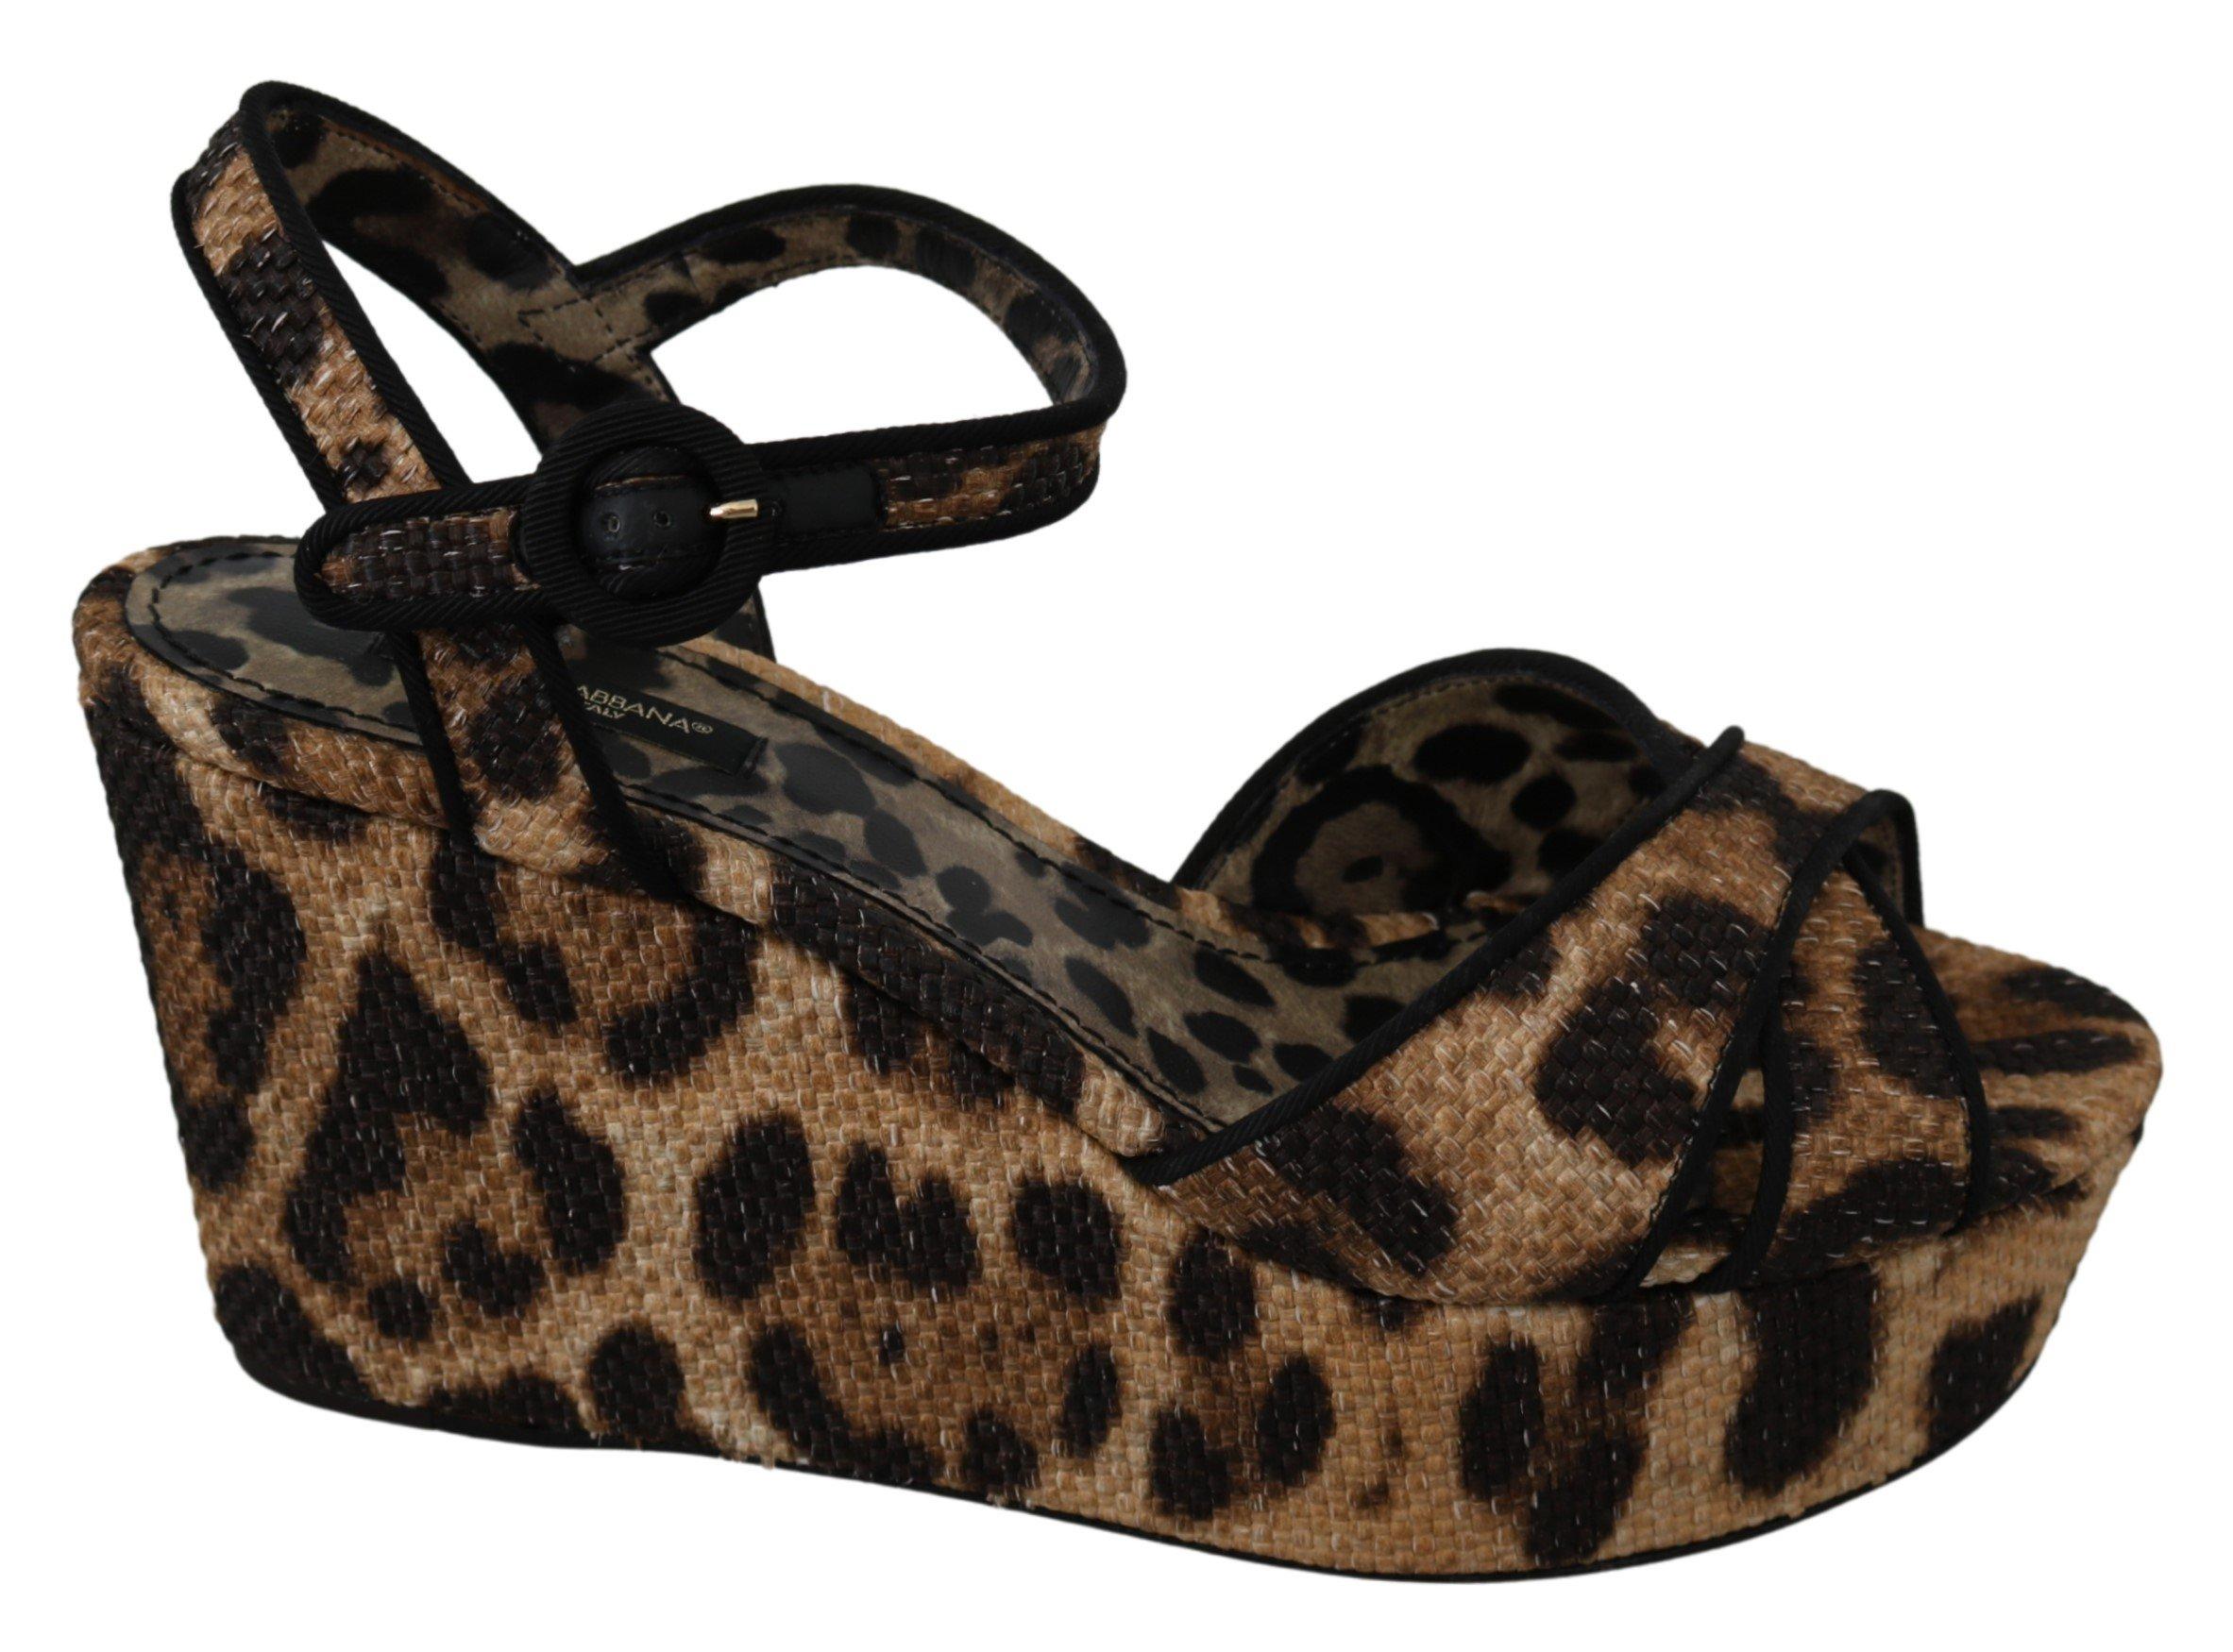 Dolce & Gabbana Women's Leopard Raffia Wedge Brown LA7321 - EU39/US8.5